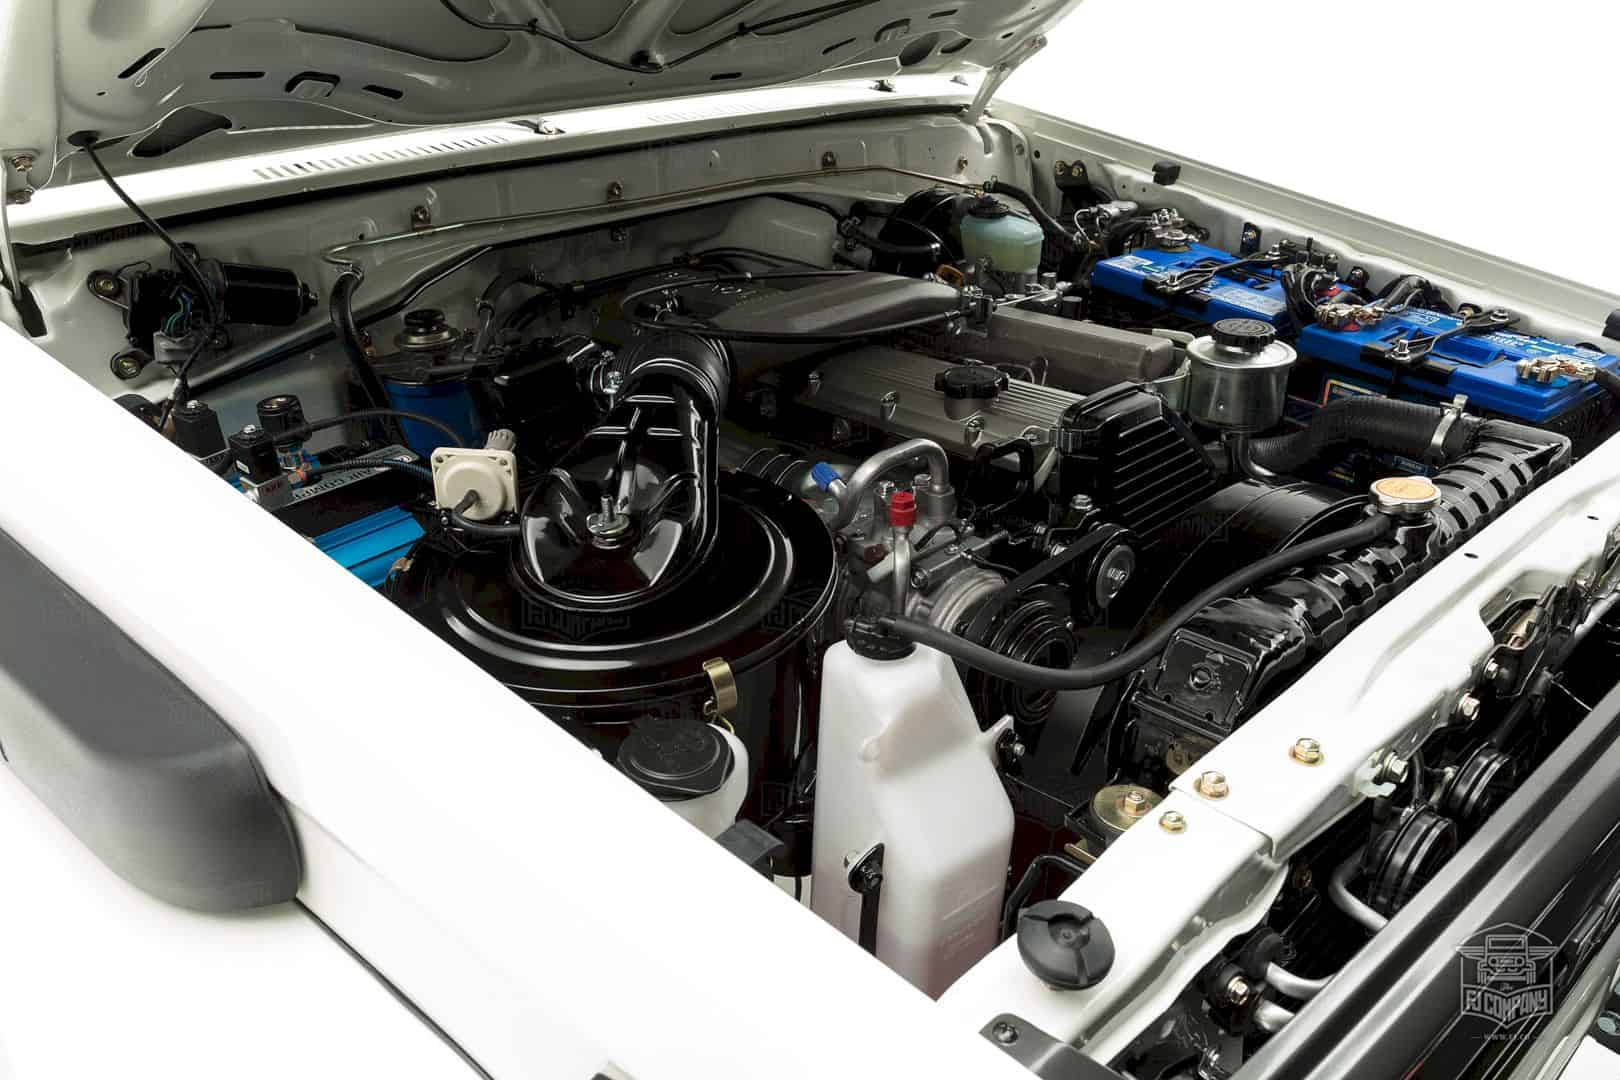 1992 Toyota Land Cruiser Hzj75 3